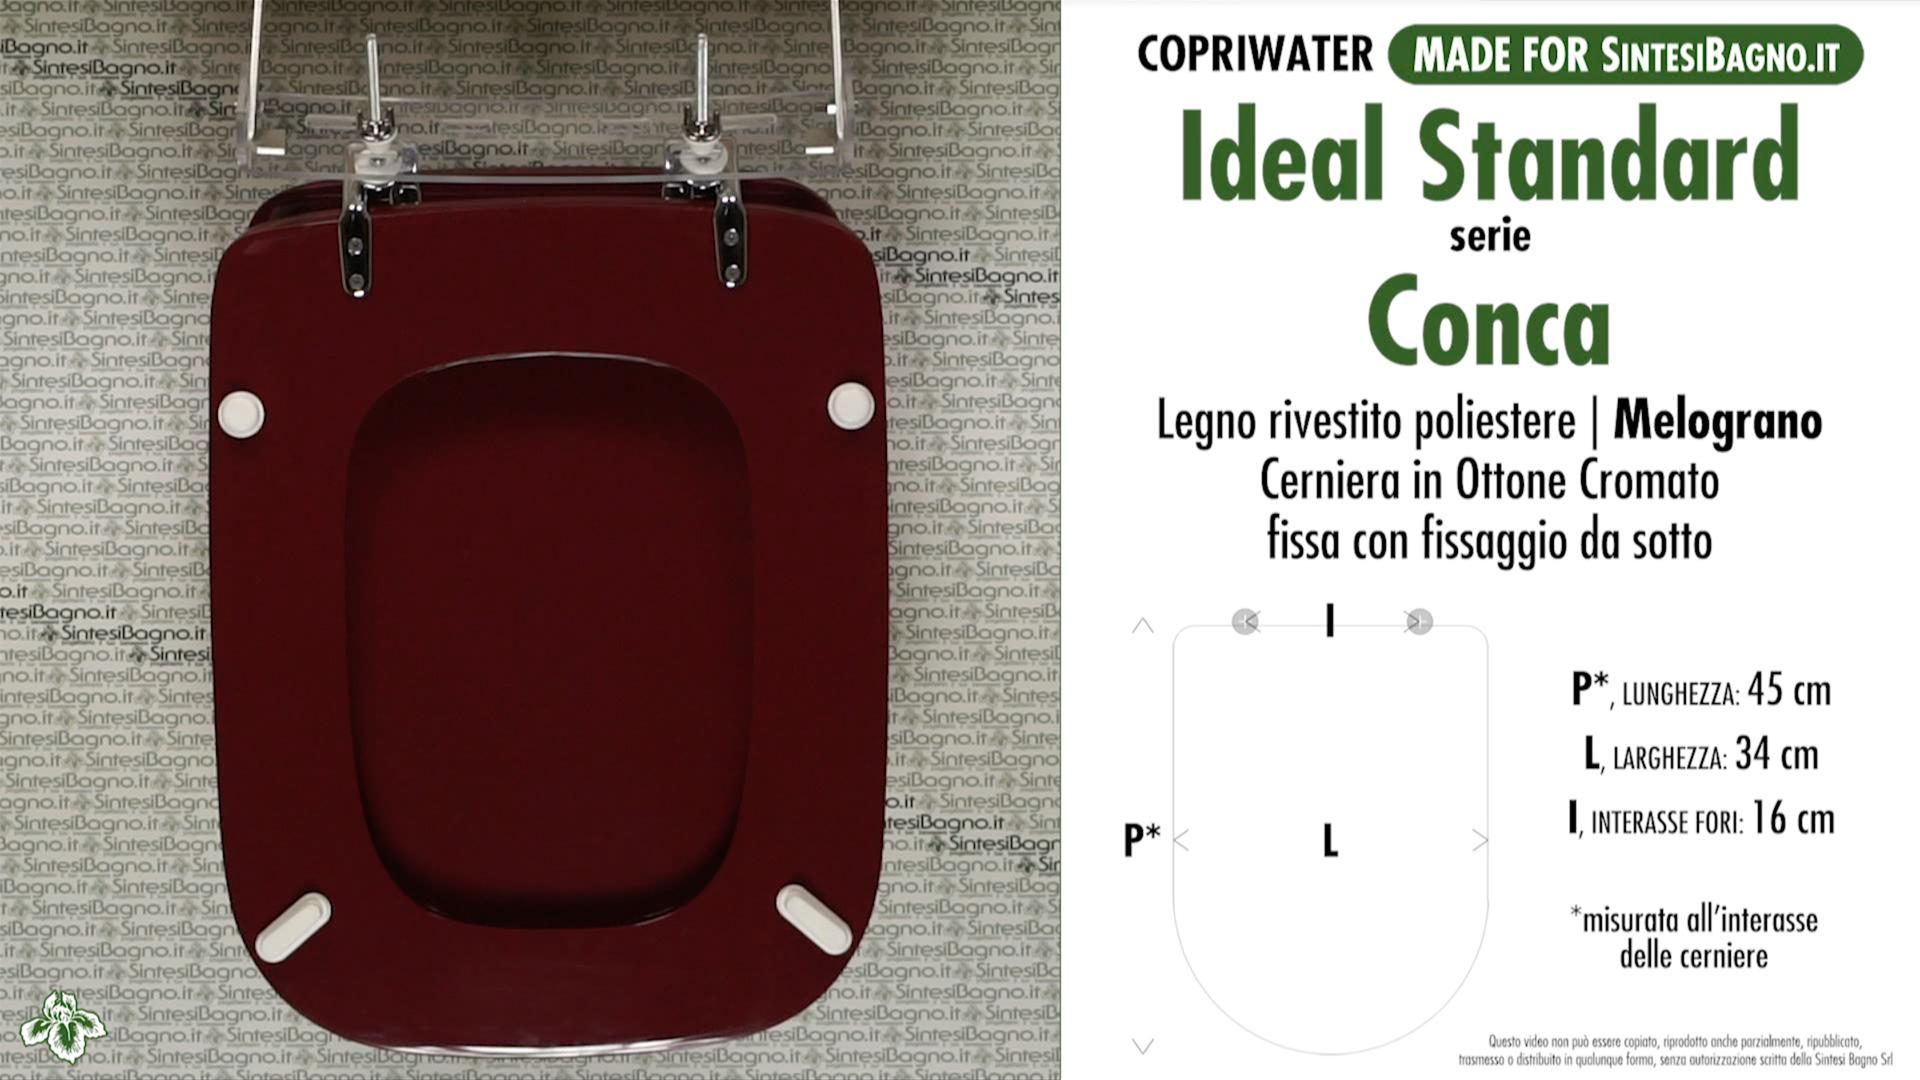 schede tecniche misure copriwater ideal standard serie conca